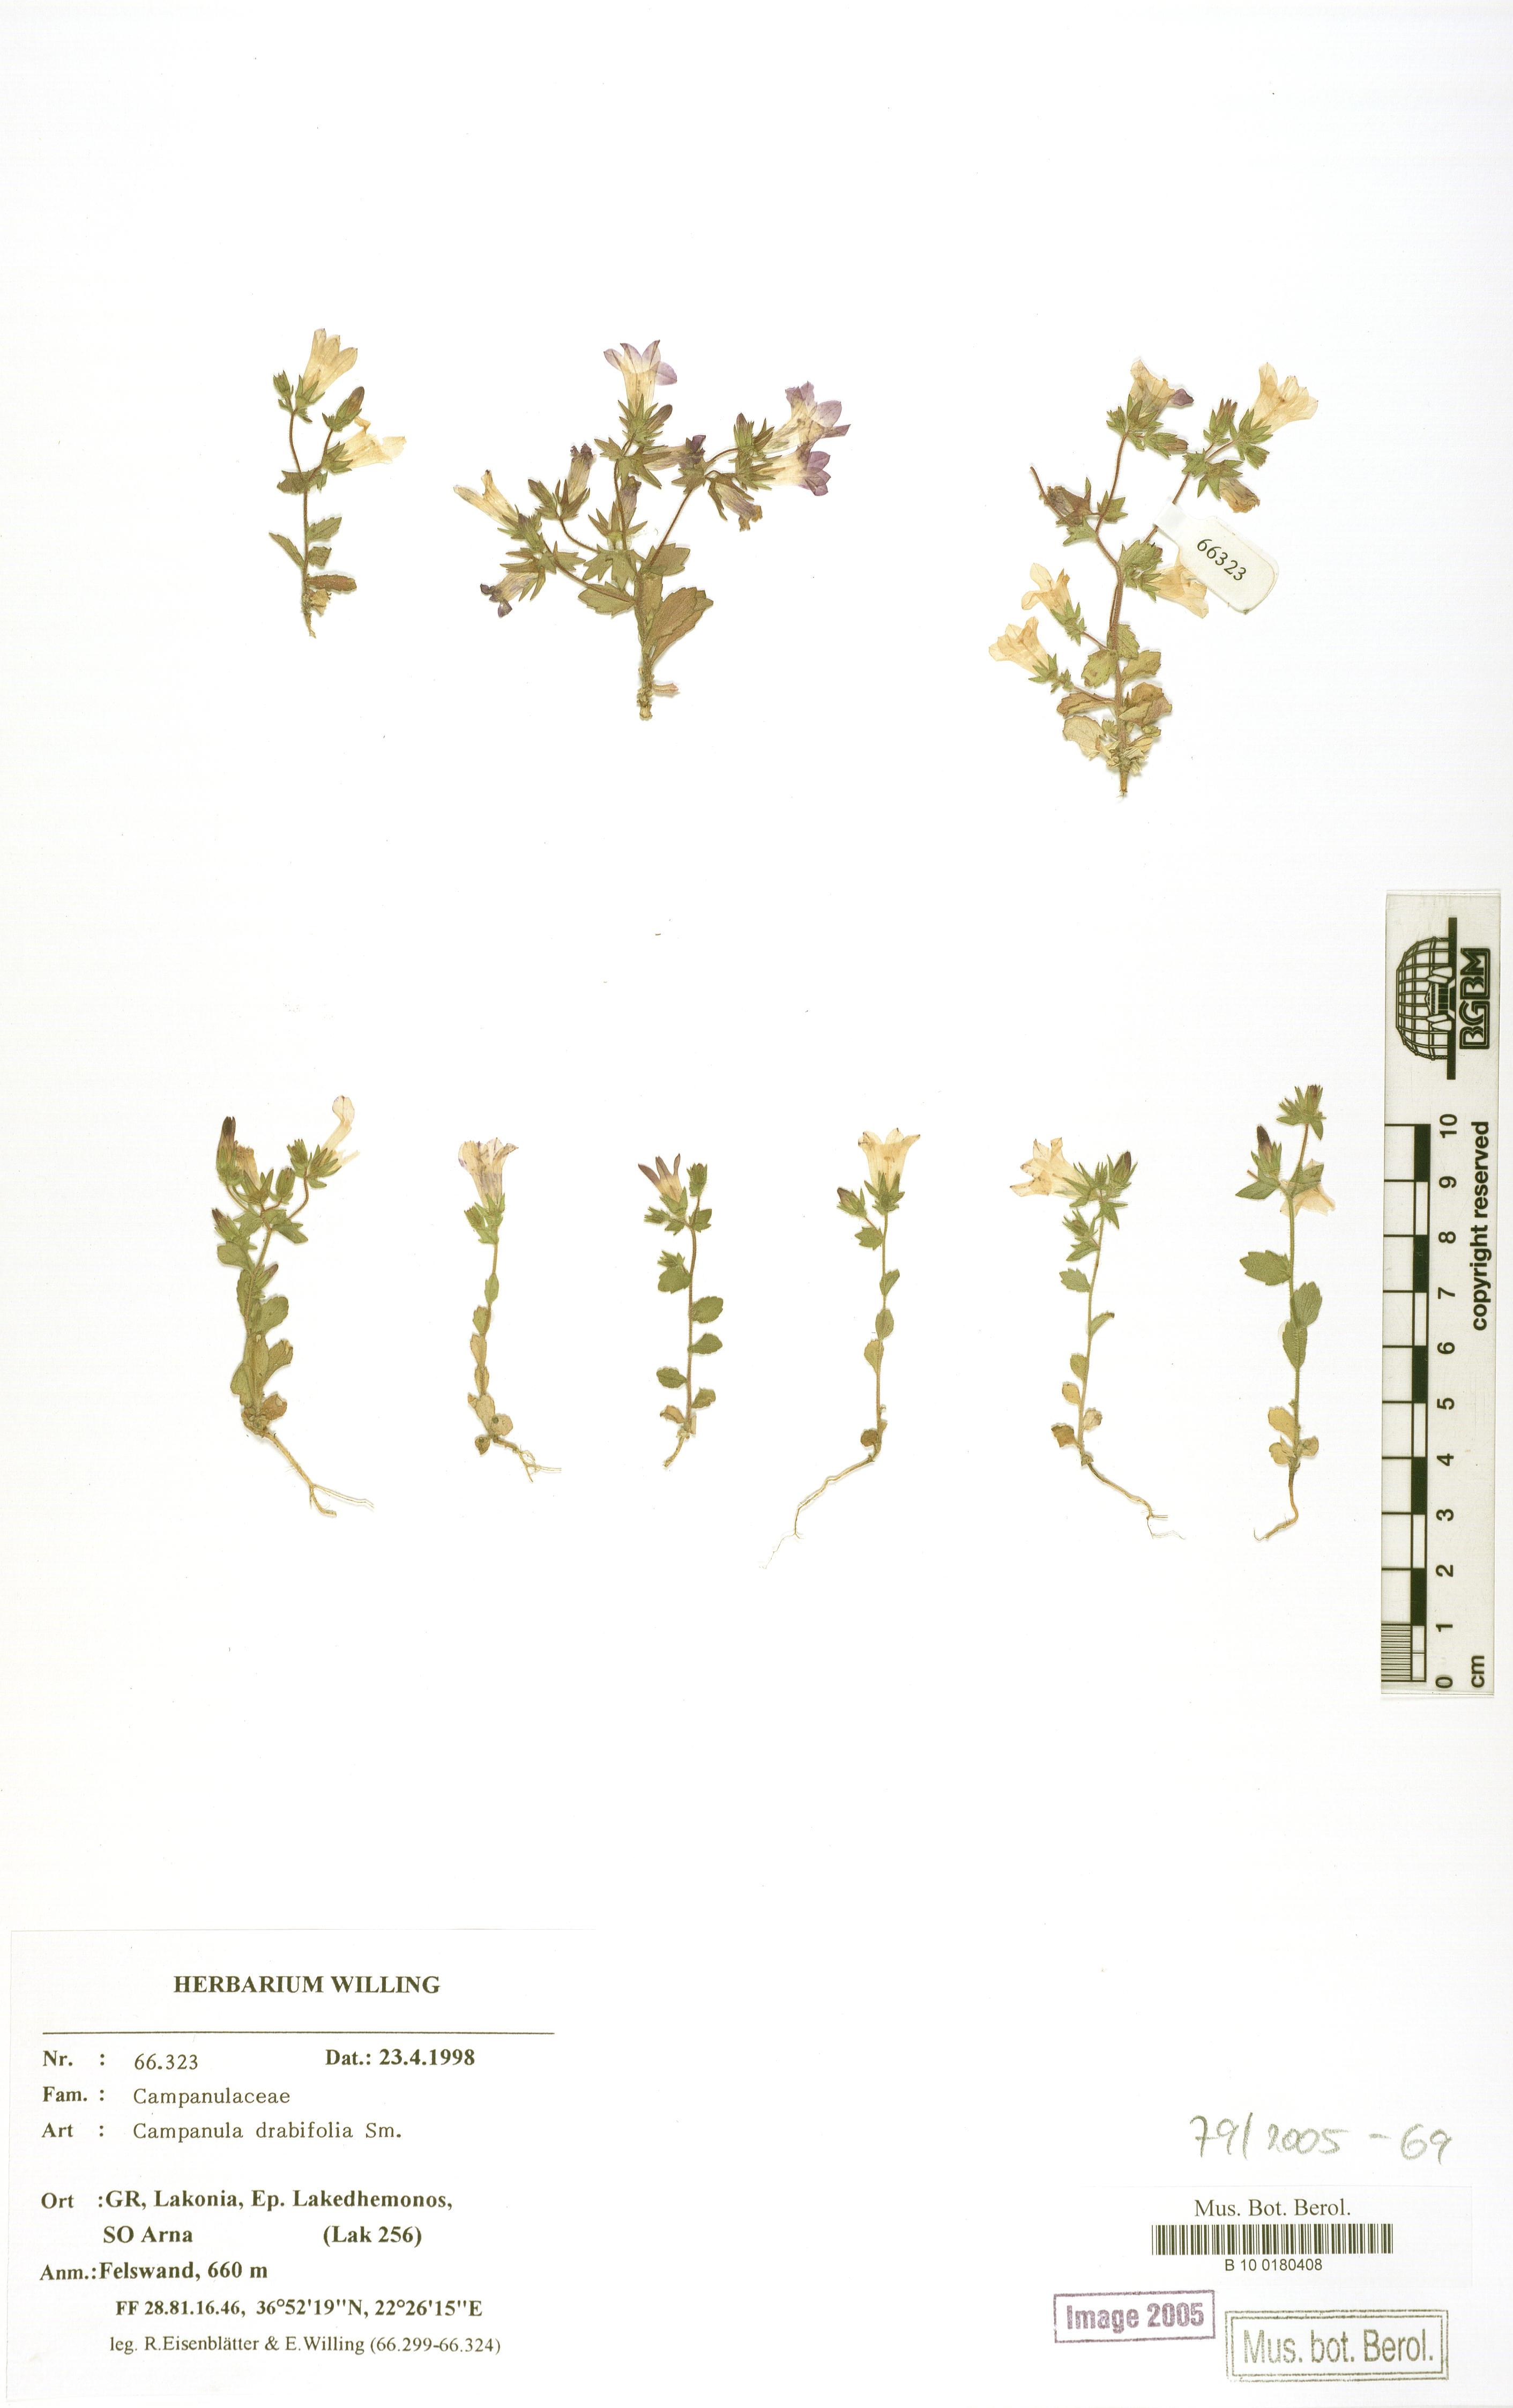 http://ww2.bgbm.org/herbarium/images/B/10/01/80/40/B_10_0180408.jpg